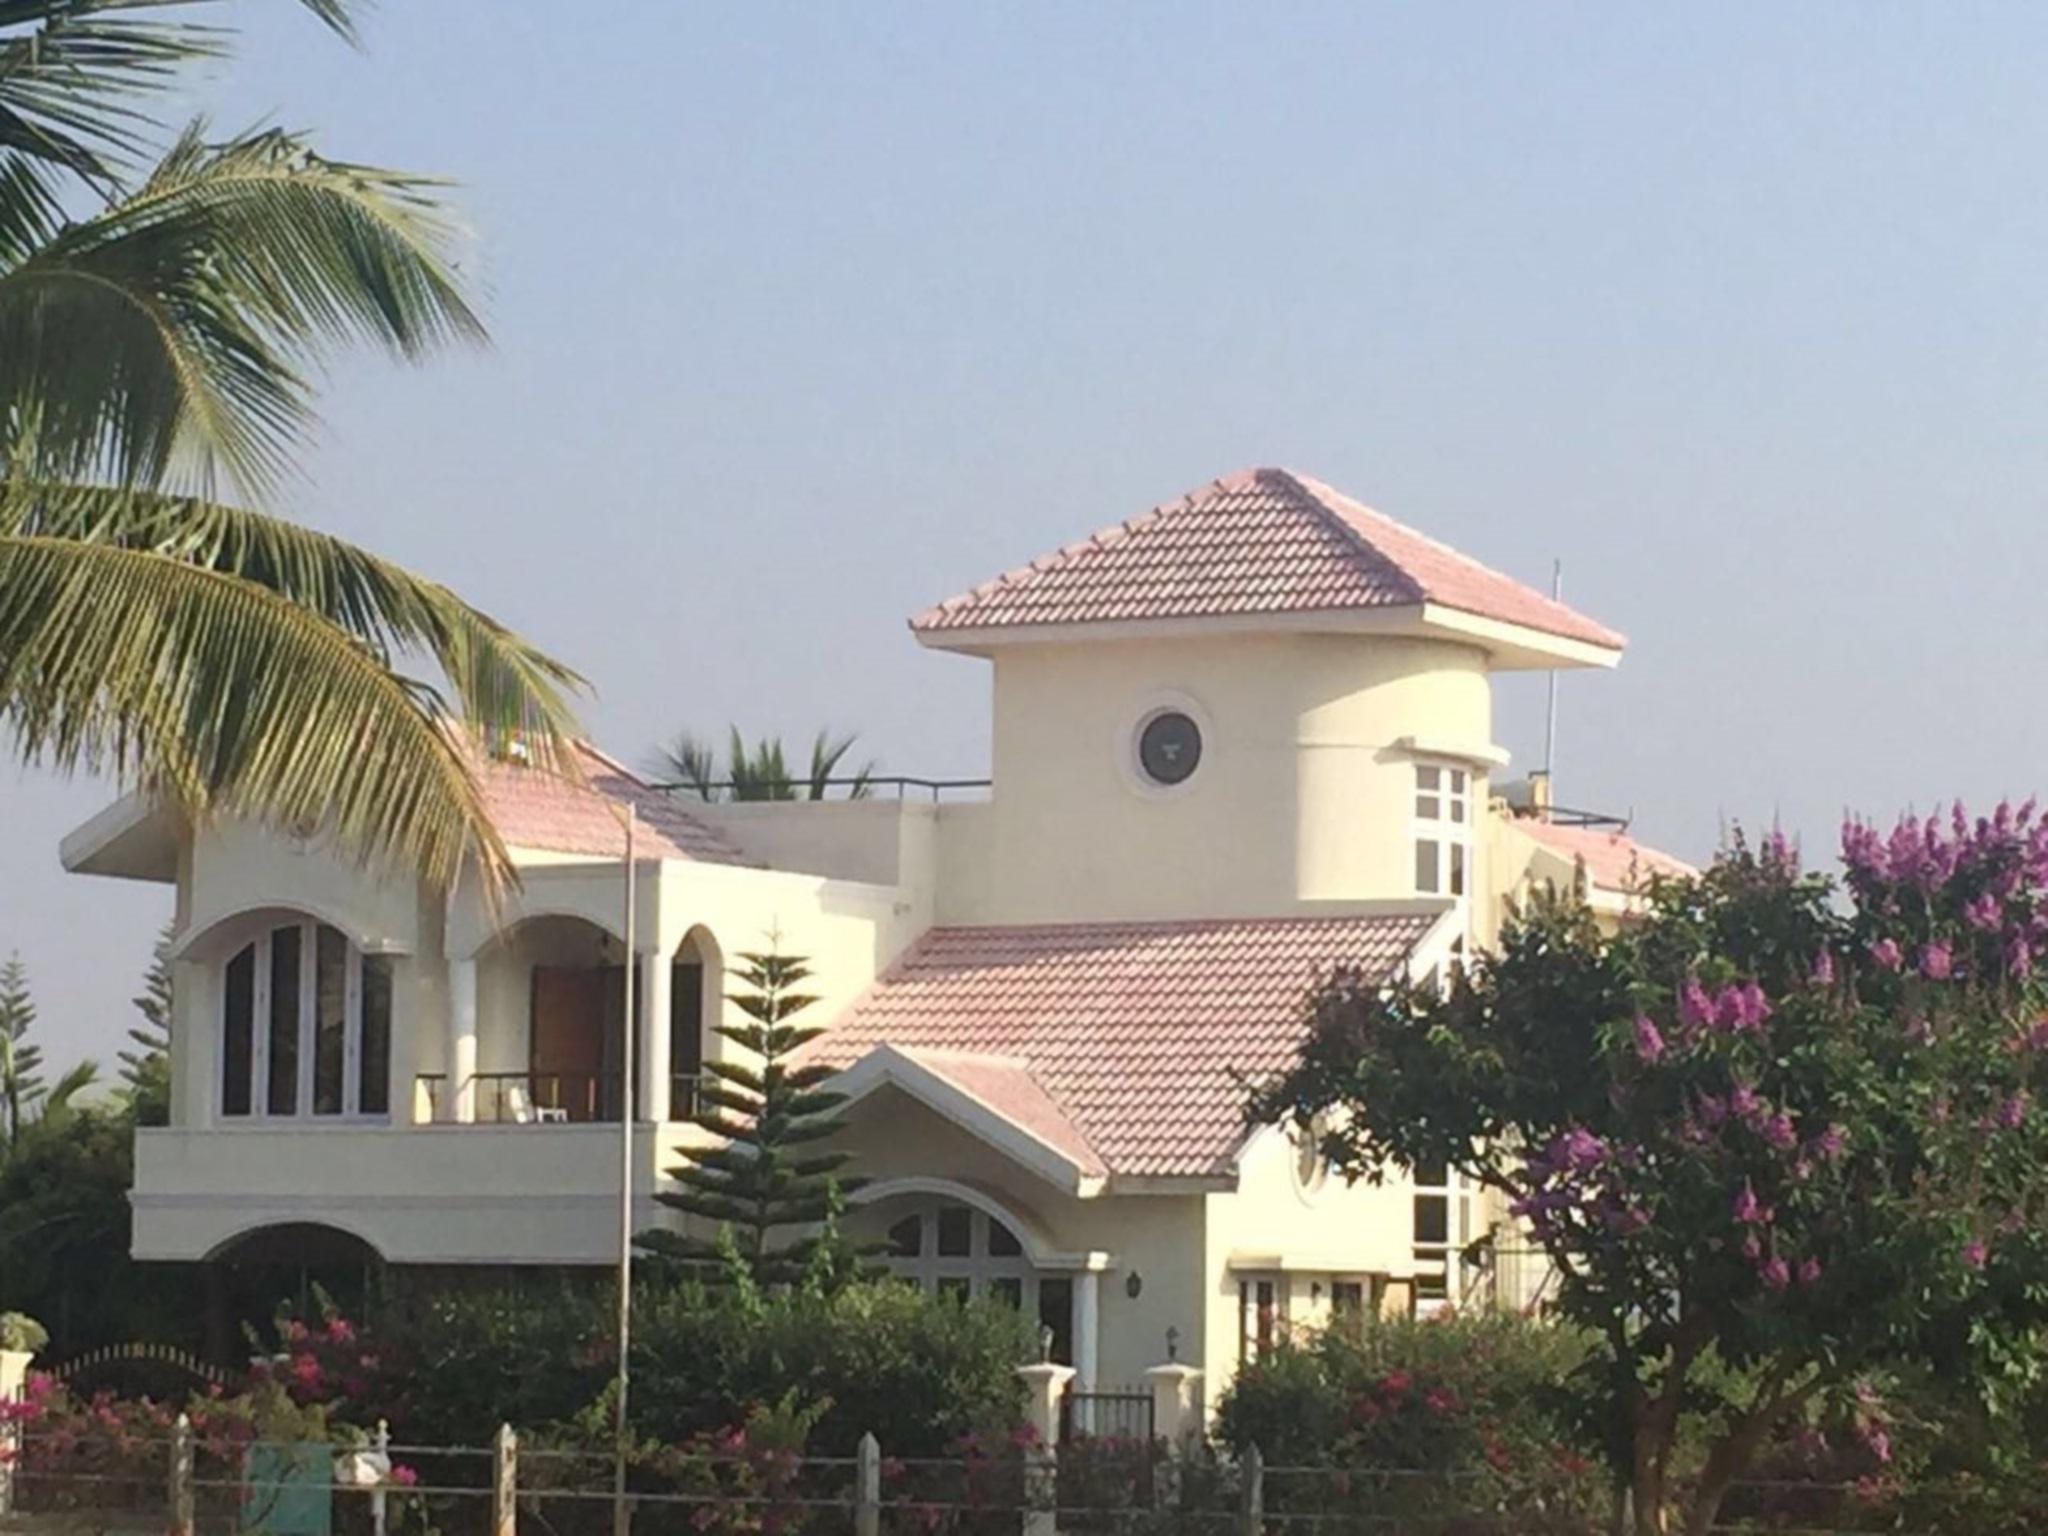 Menezes Luxury Service Villa, Bangalore Rural